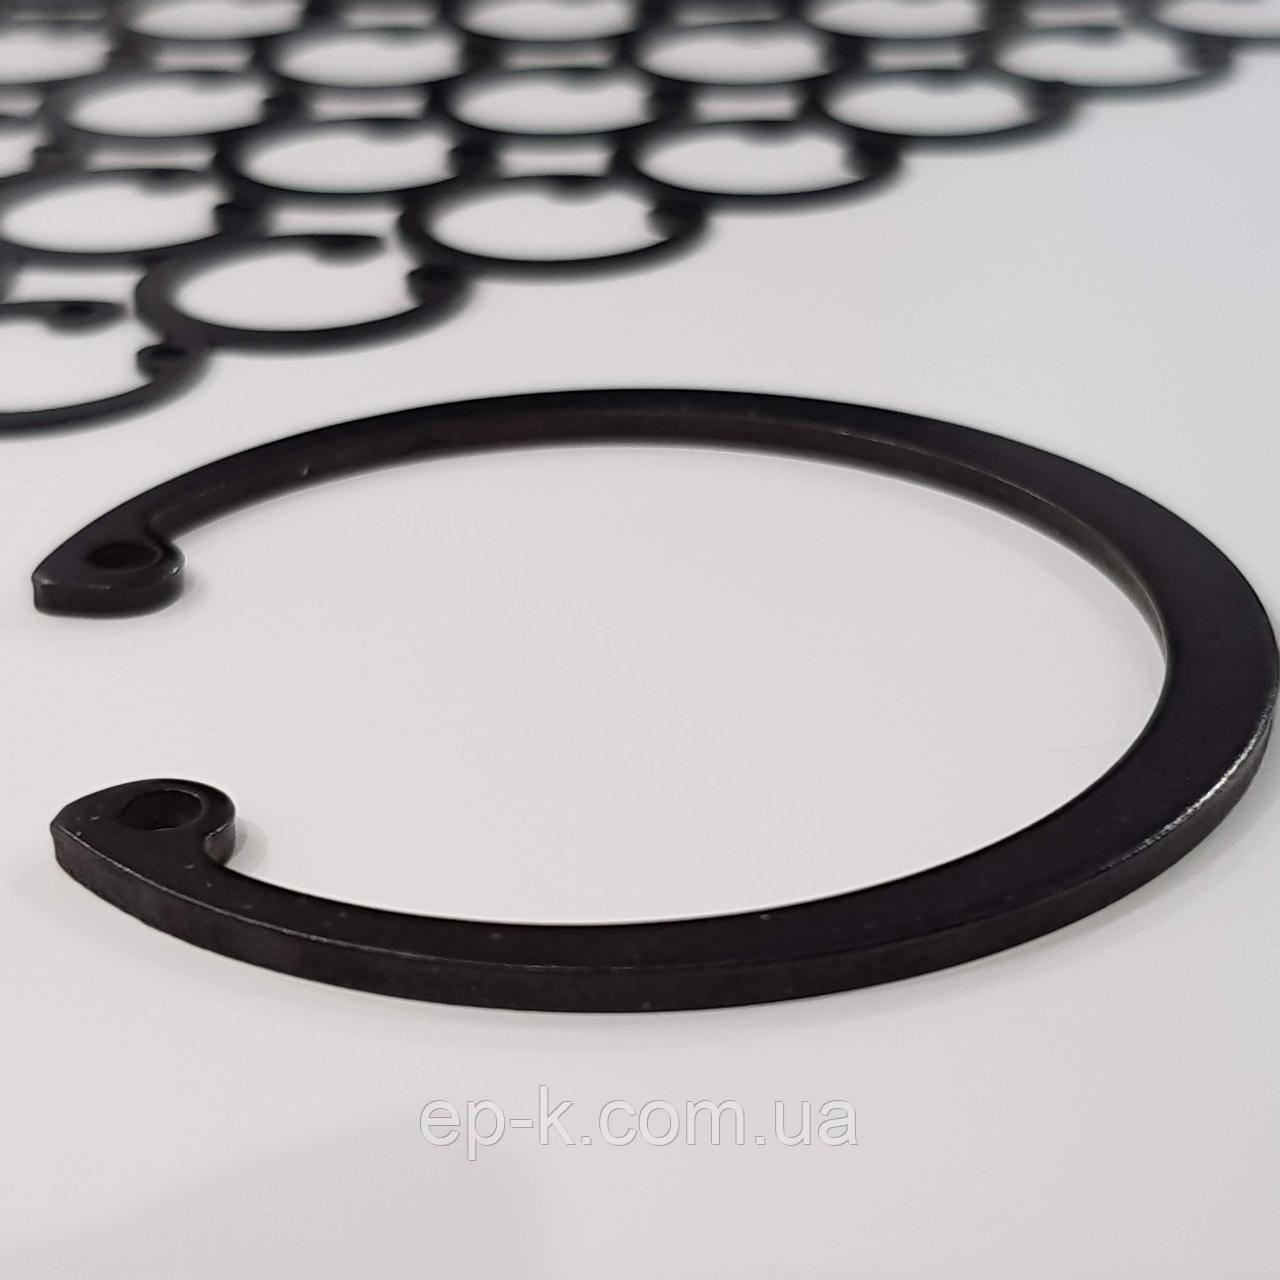 Стопорное кольцо внутреннее А210  ГОСТ 13943-86, DIN 472